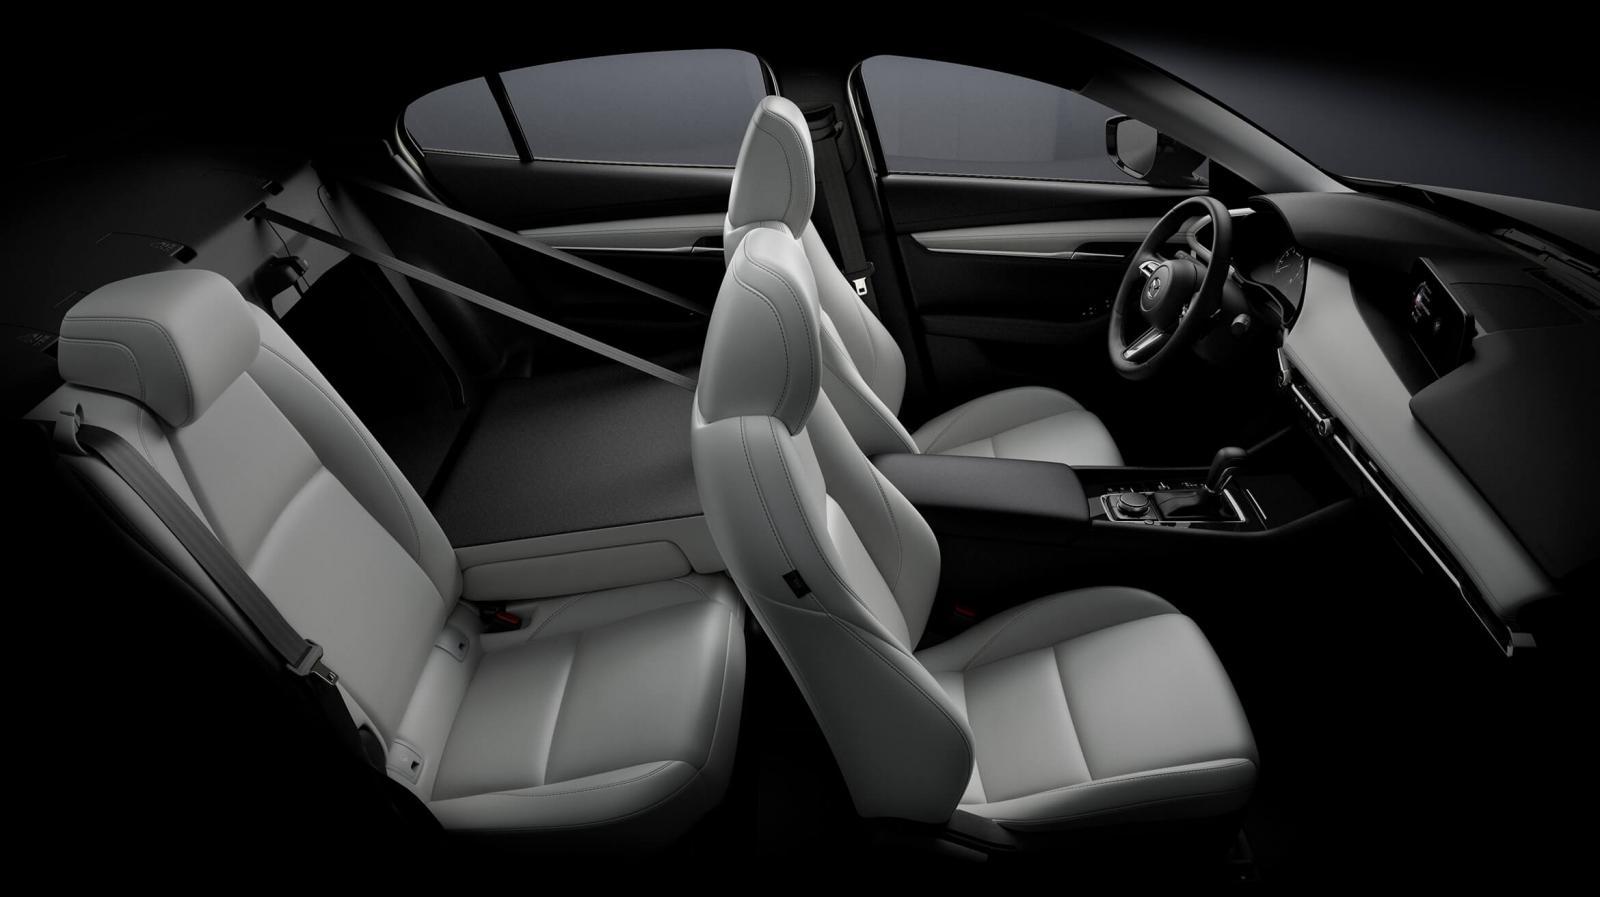 Mazda 3 Sedán i Grand Touring 2020 Kia Forte Sedán 2.0 GT Line 2020 comparativa